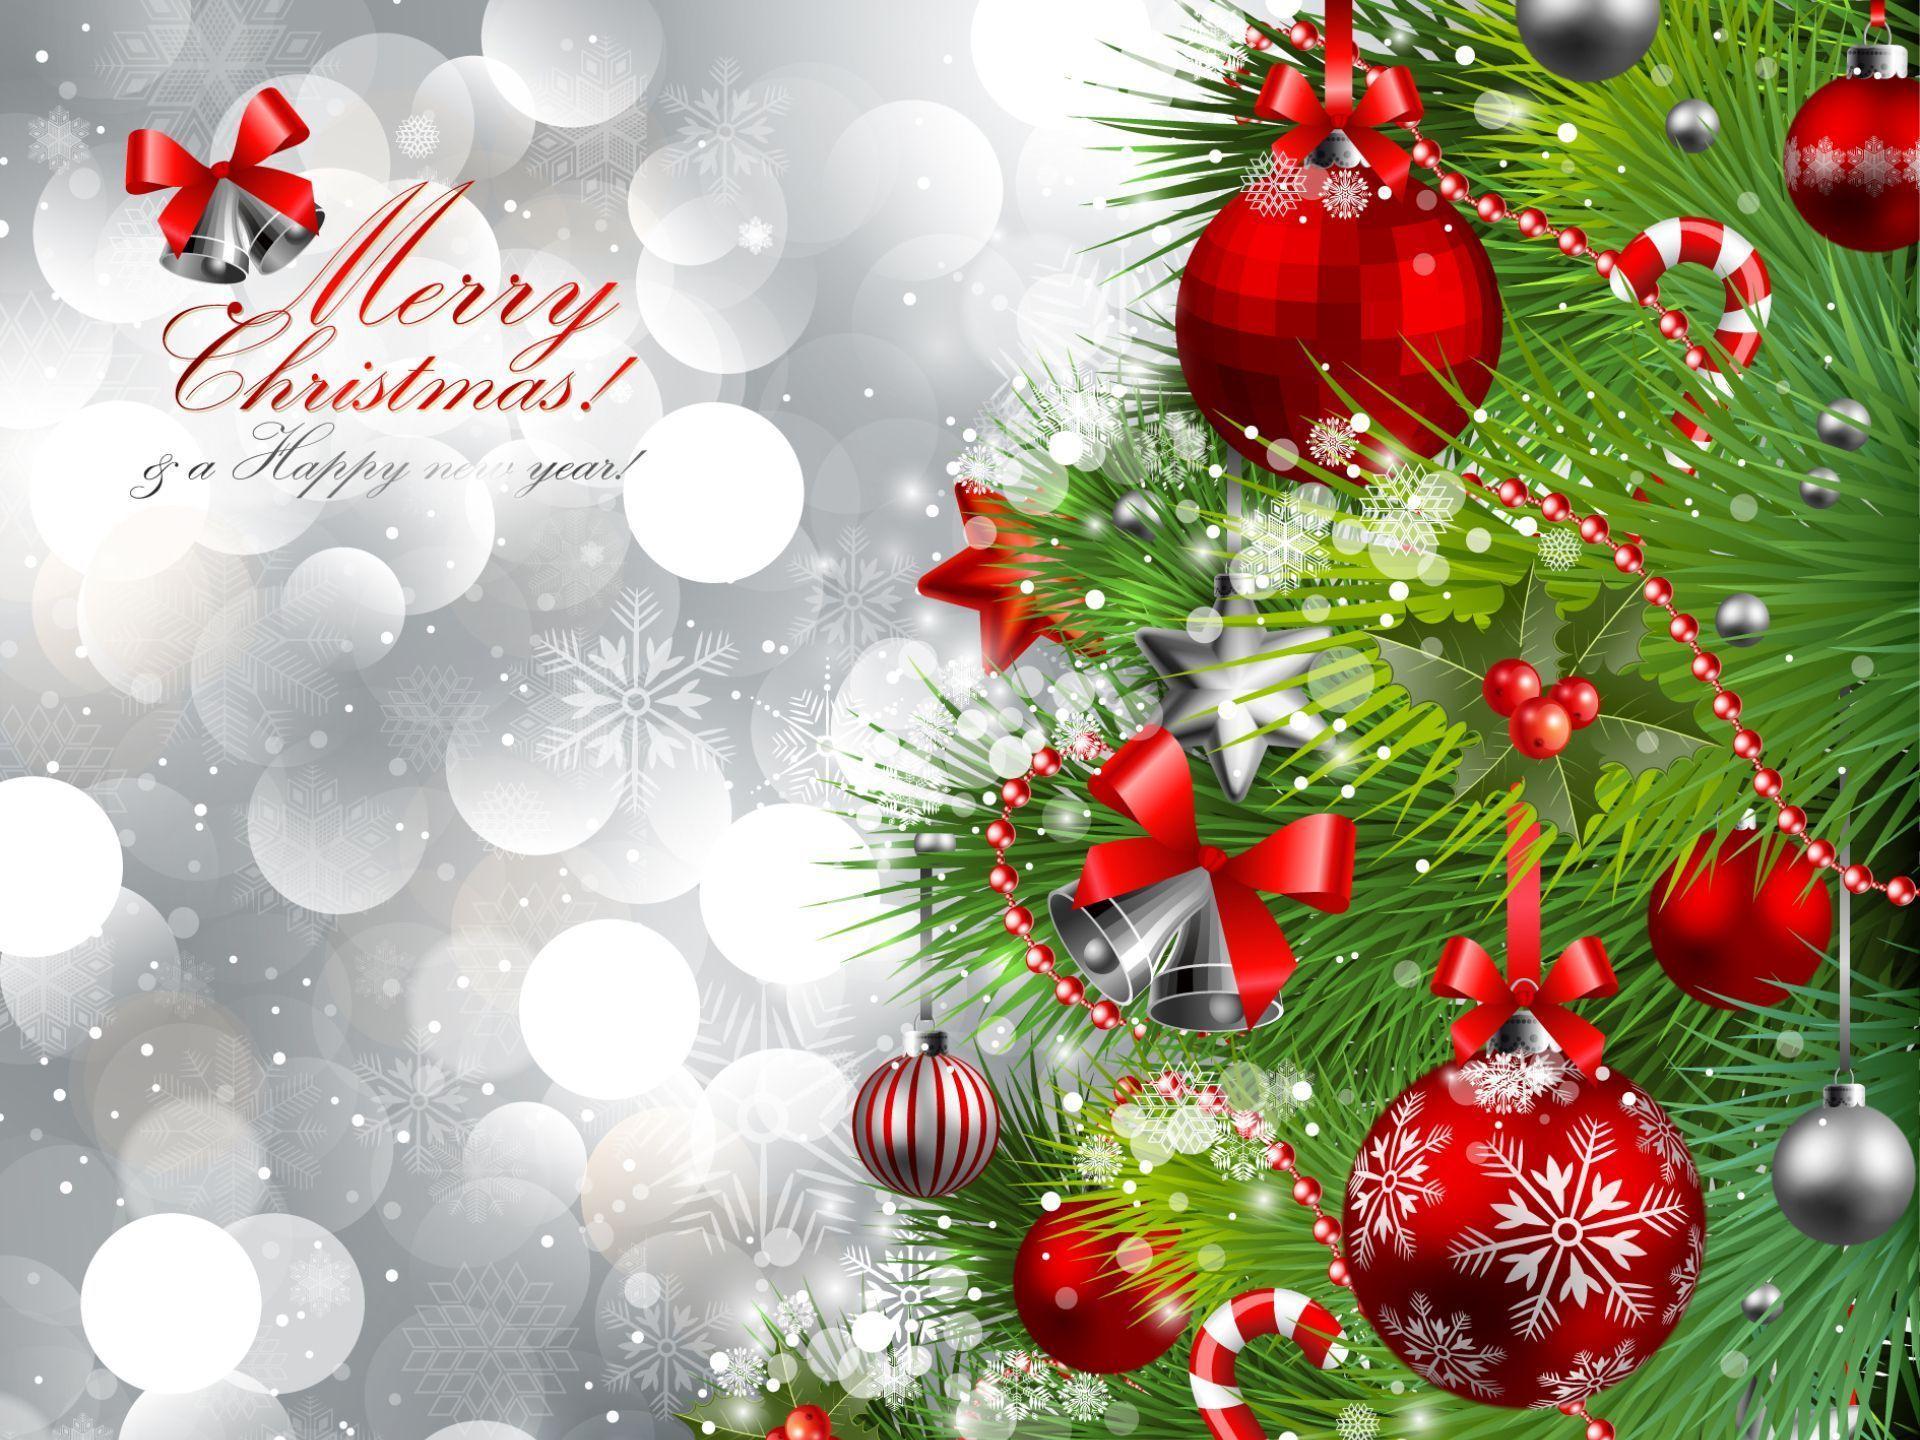 2021 Christmas Images Wallpaper For Desktop Christmas 2021 Wallpapers Top Free Christmas 2021 Backgrounds Wallpaperaccess